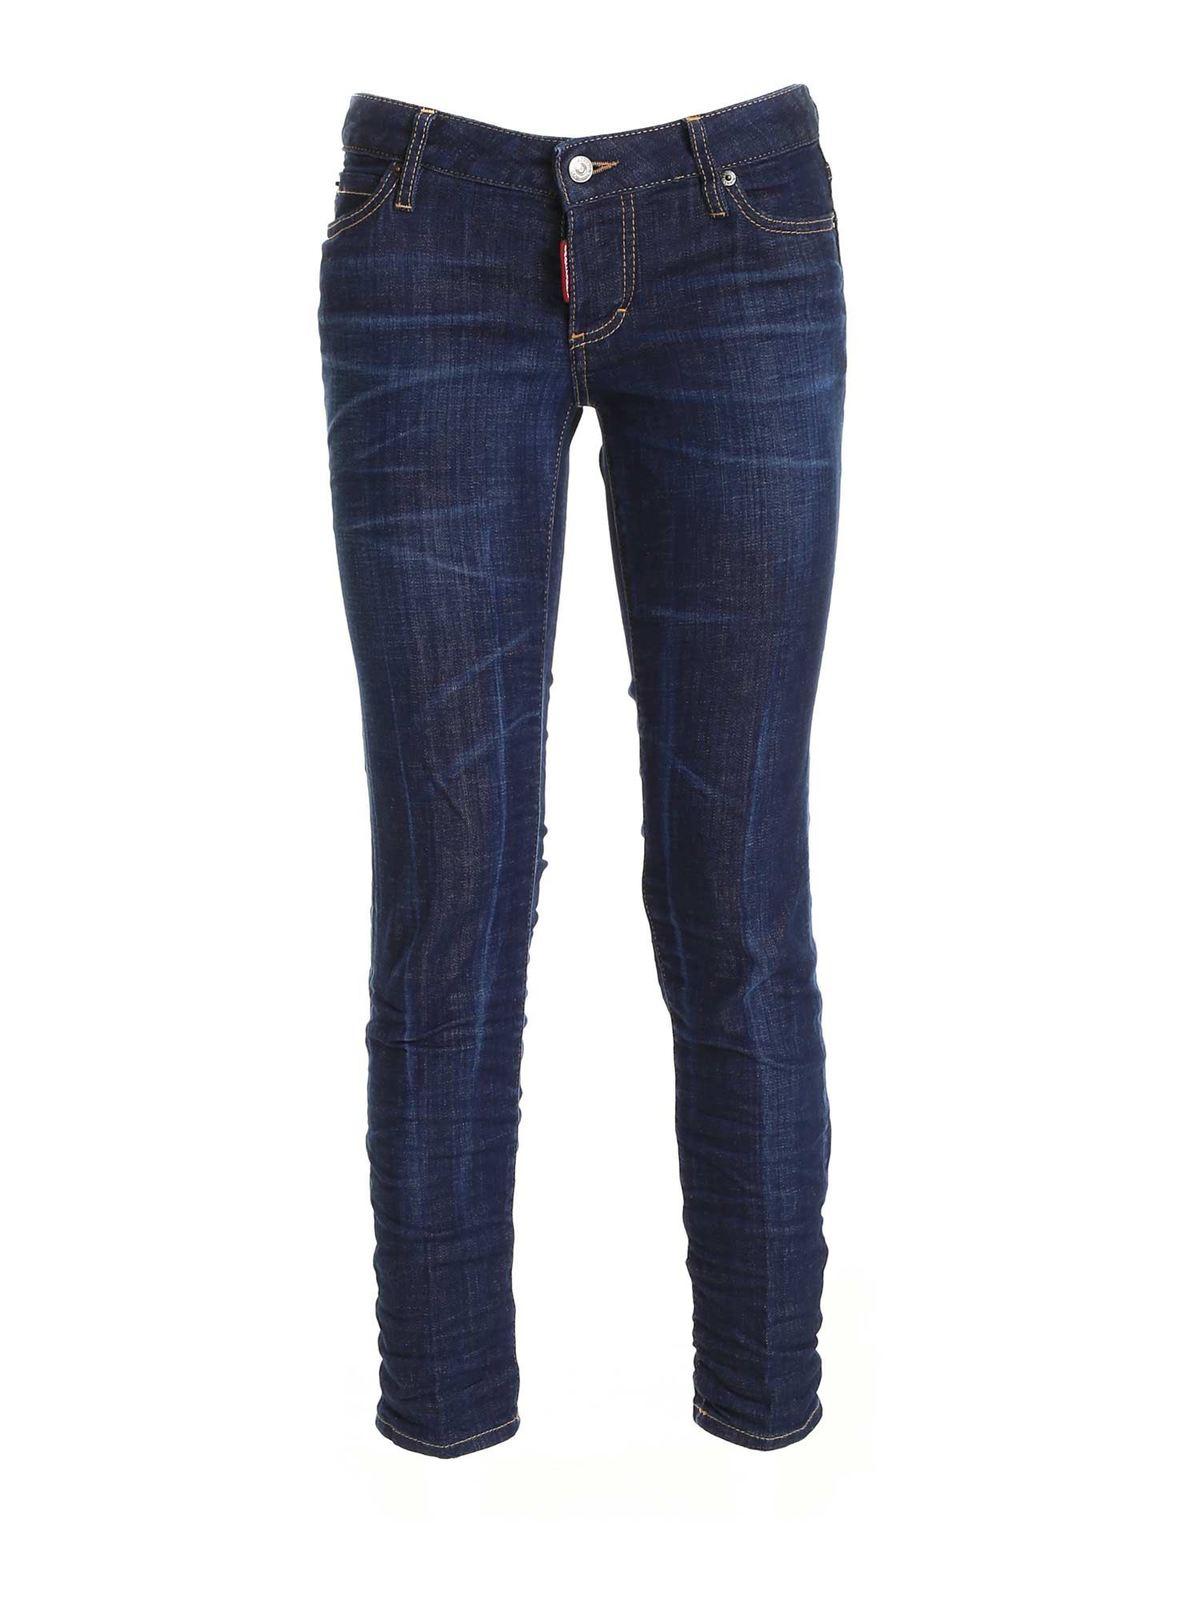 Dsquared2 Skinny jeans JENNIFER JEANS IN BLUE